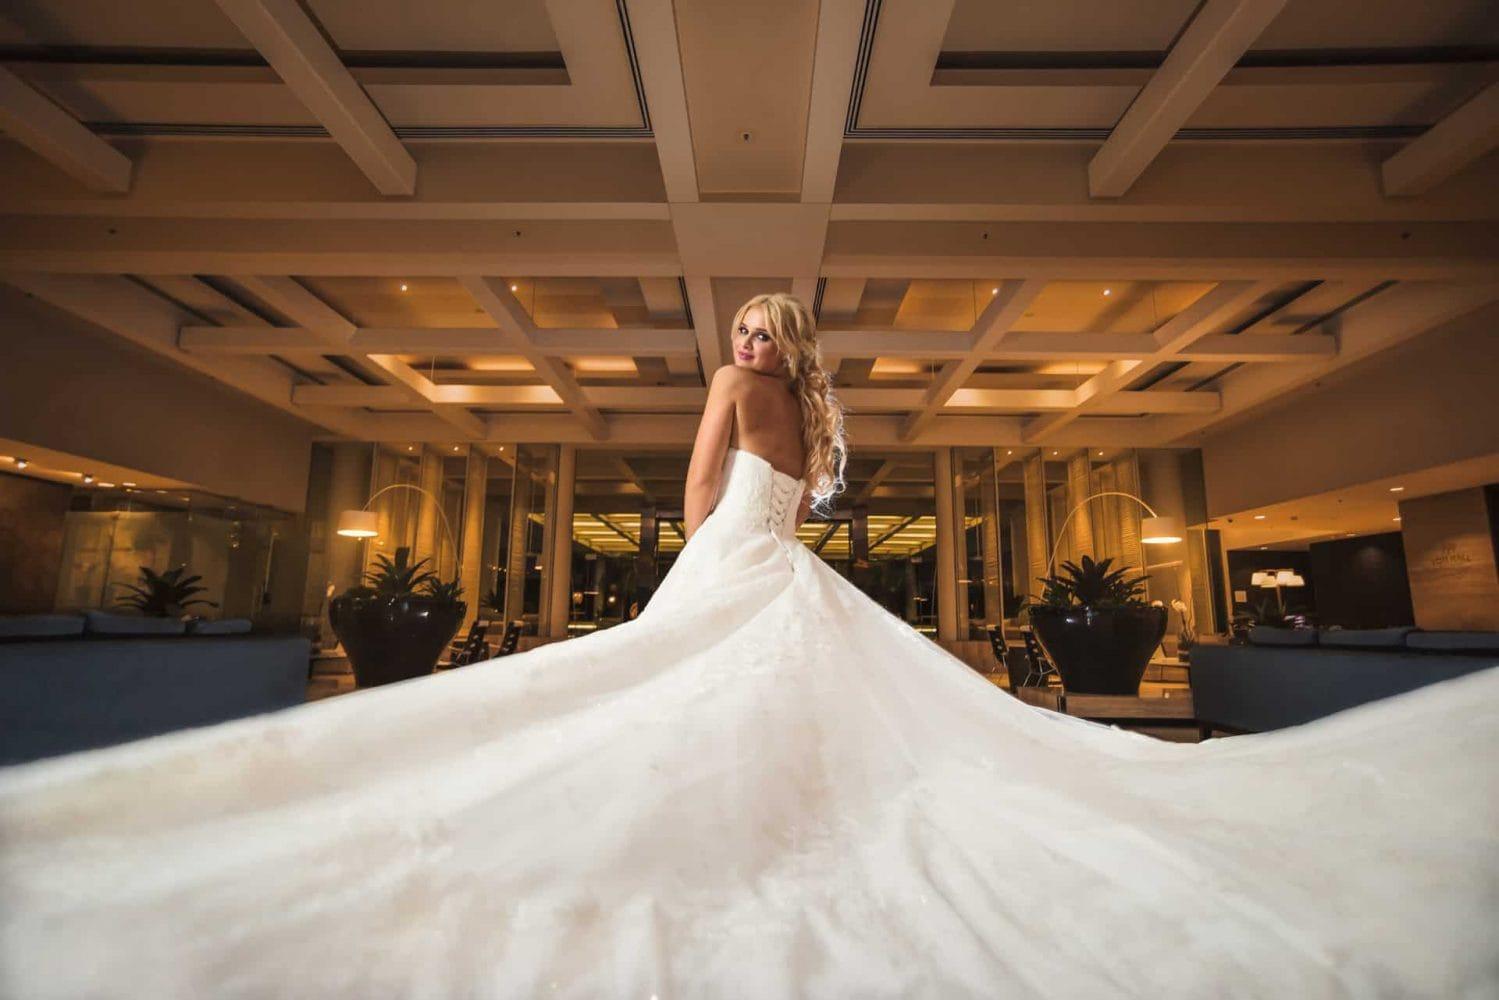 Sheraton-Grand-Mirage-Wedding-Photos-by-Tom-Hall-Photography